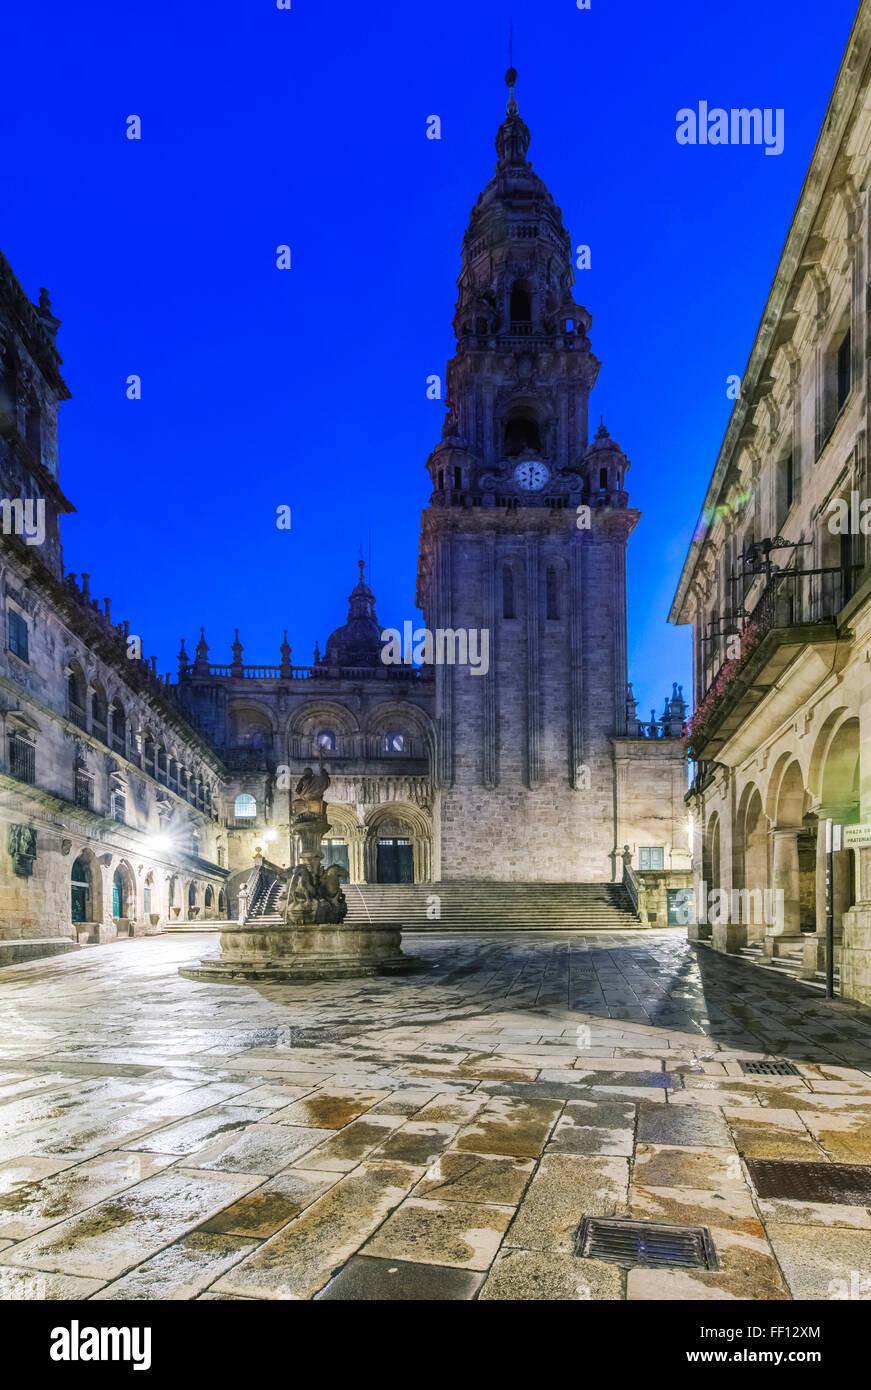 Ornate church and tower with fountain, Santiago de Compostela, A Coruna, Spain Stock Photo